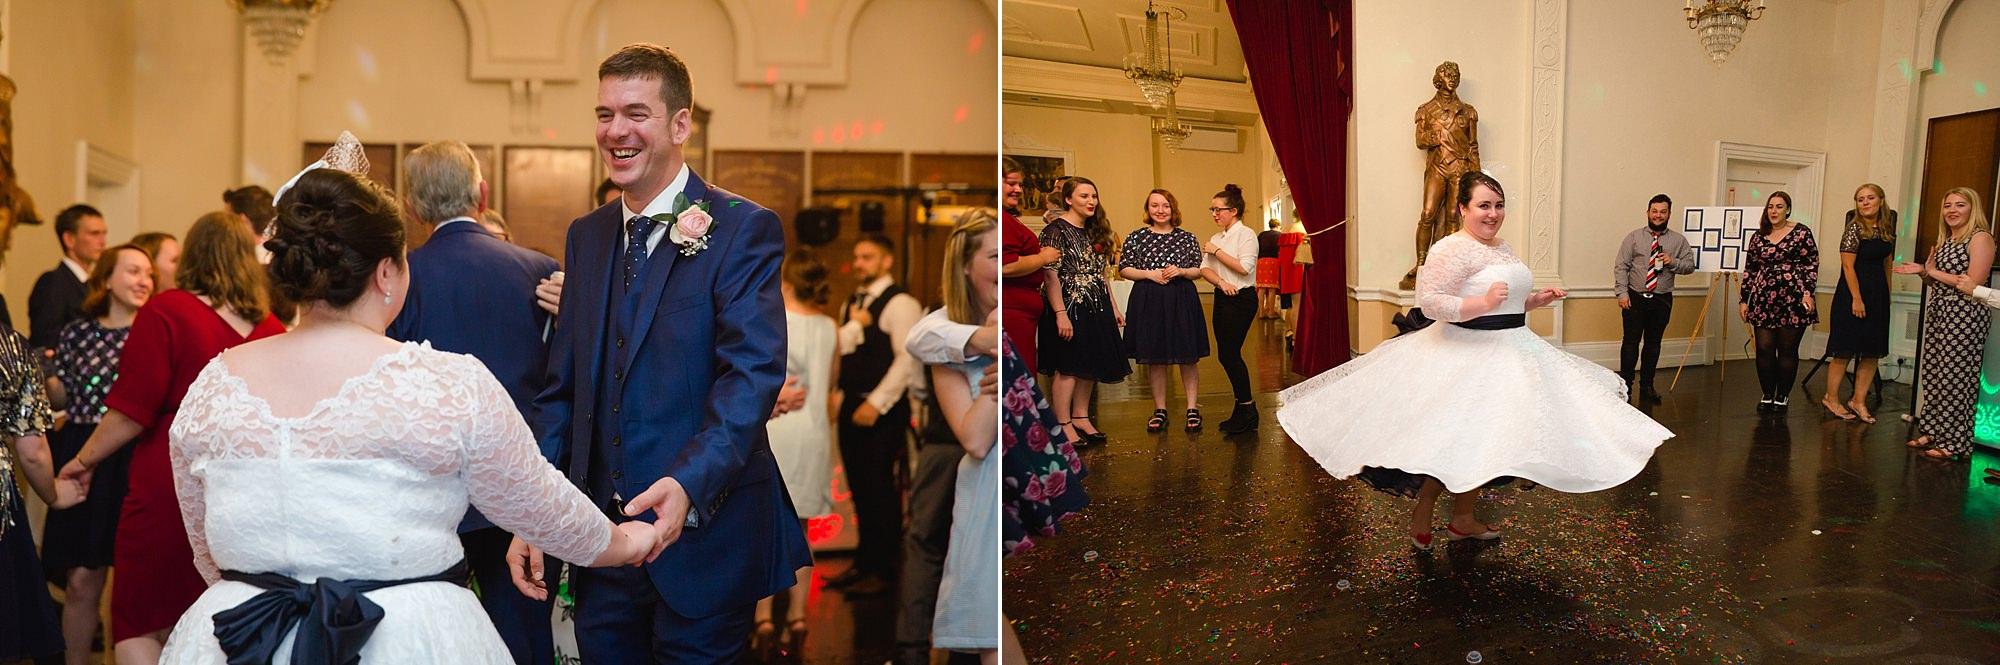 Trafalgar Tavern wedding dancing guests